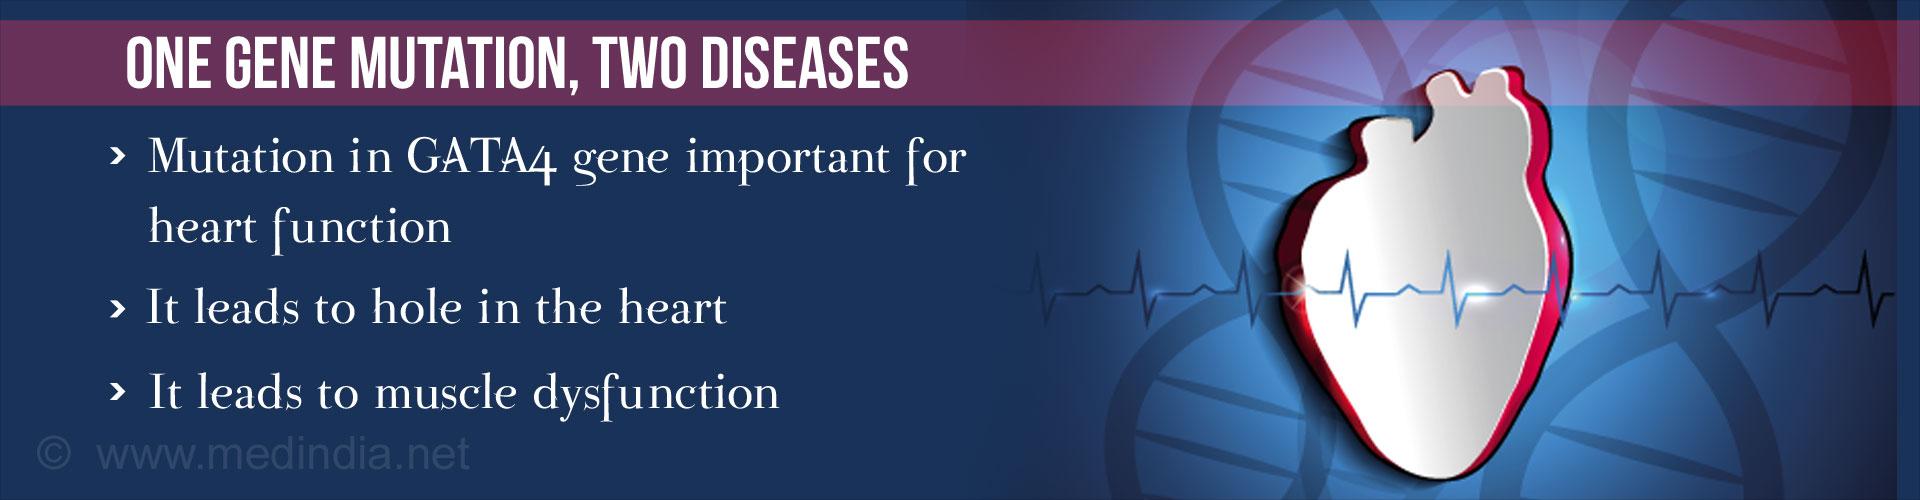 Multiple Congenital Heart Defects Linked to a Single Gene Mutation